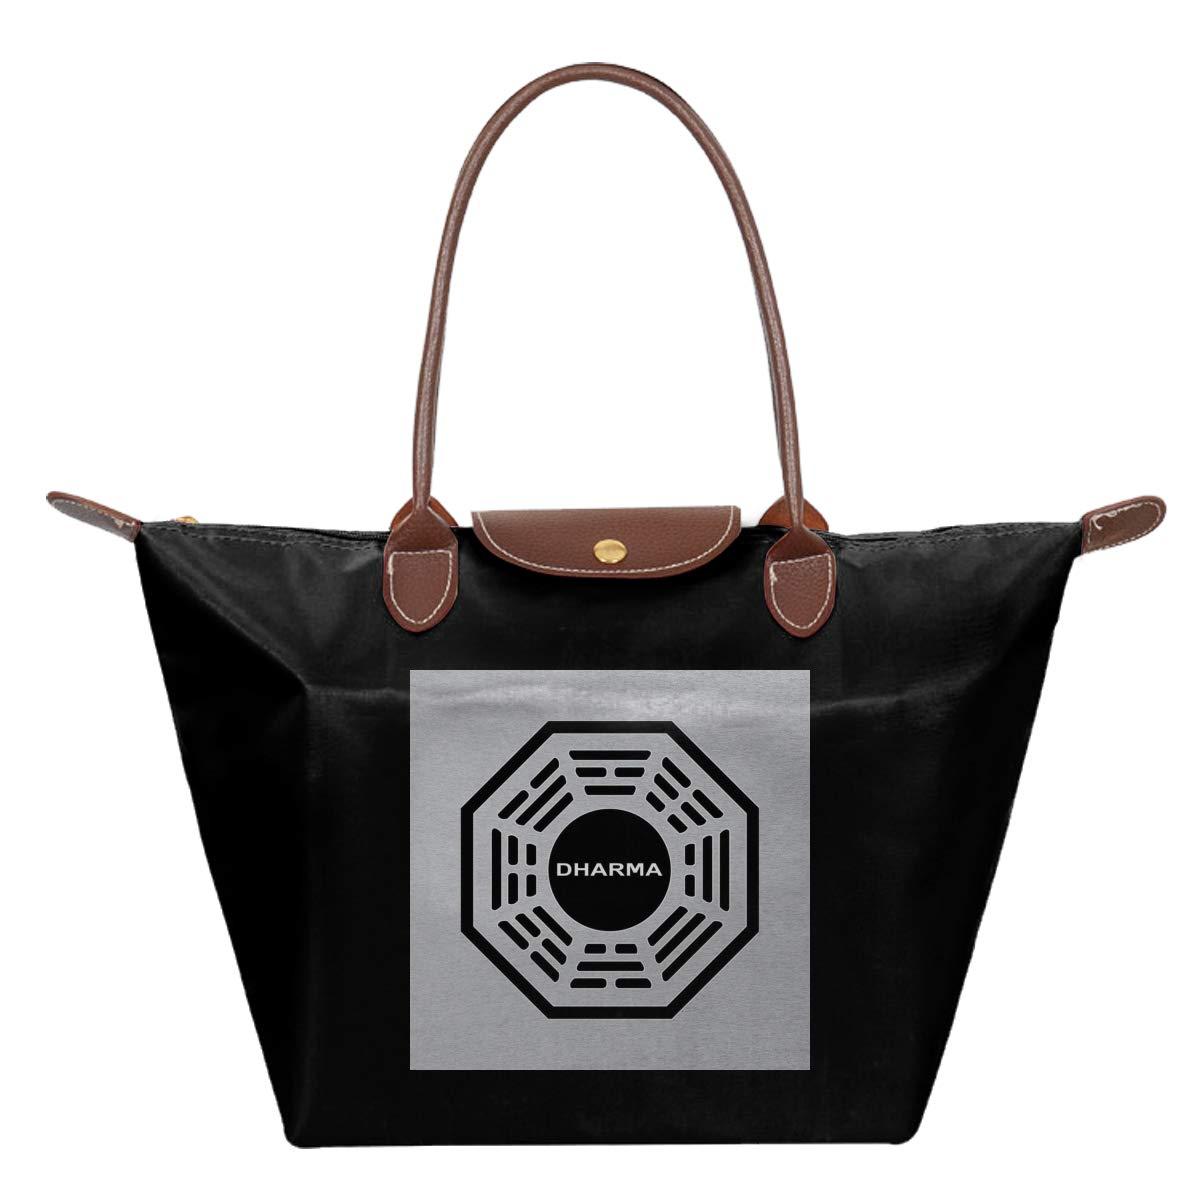 Dharma Initiative Logo Lost Waterproof Leather Folded Messenger Nylon Bag Travel Tote Hopping Folding School Handbags